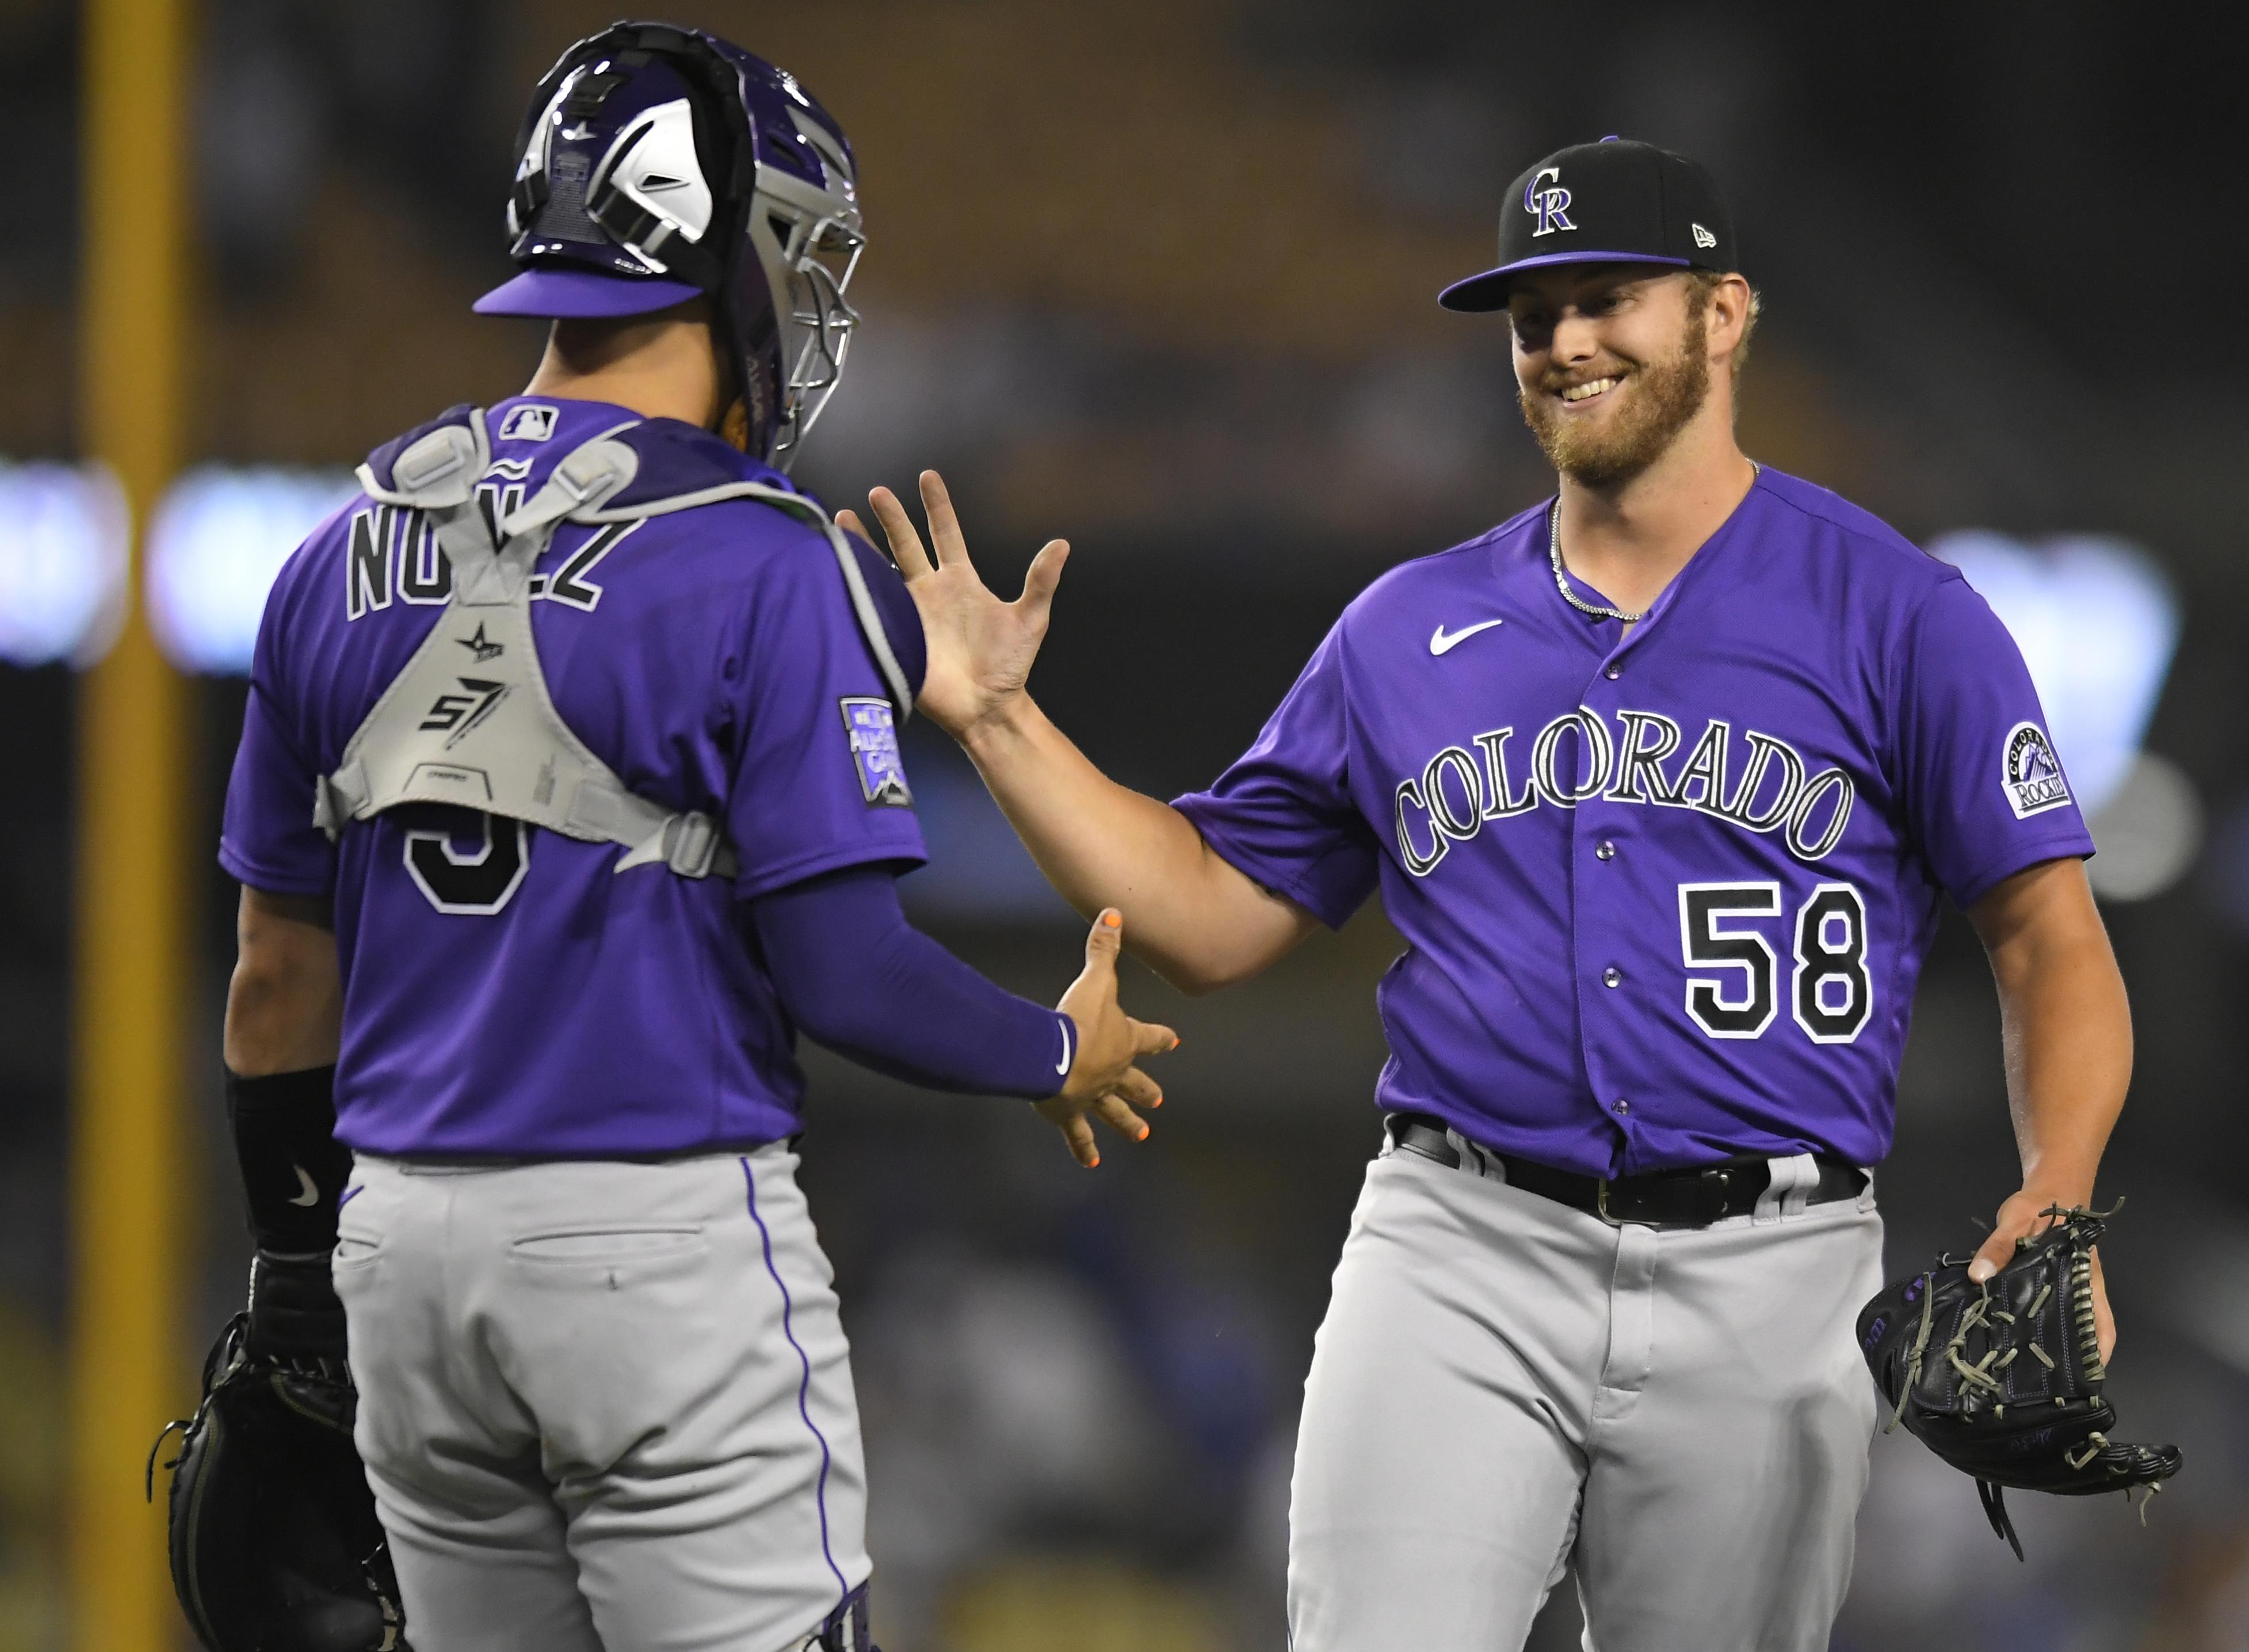 MLB: JUL 23 Rockies at Dodgers